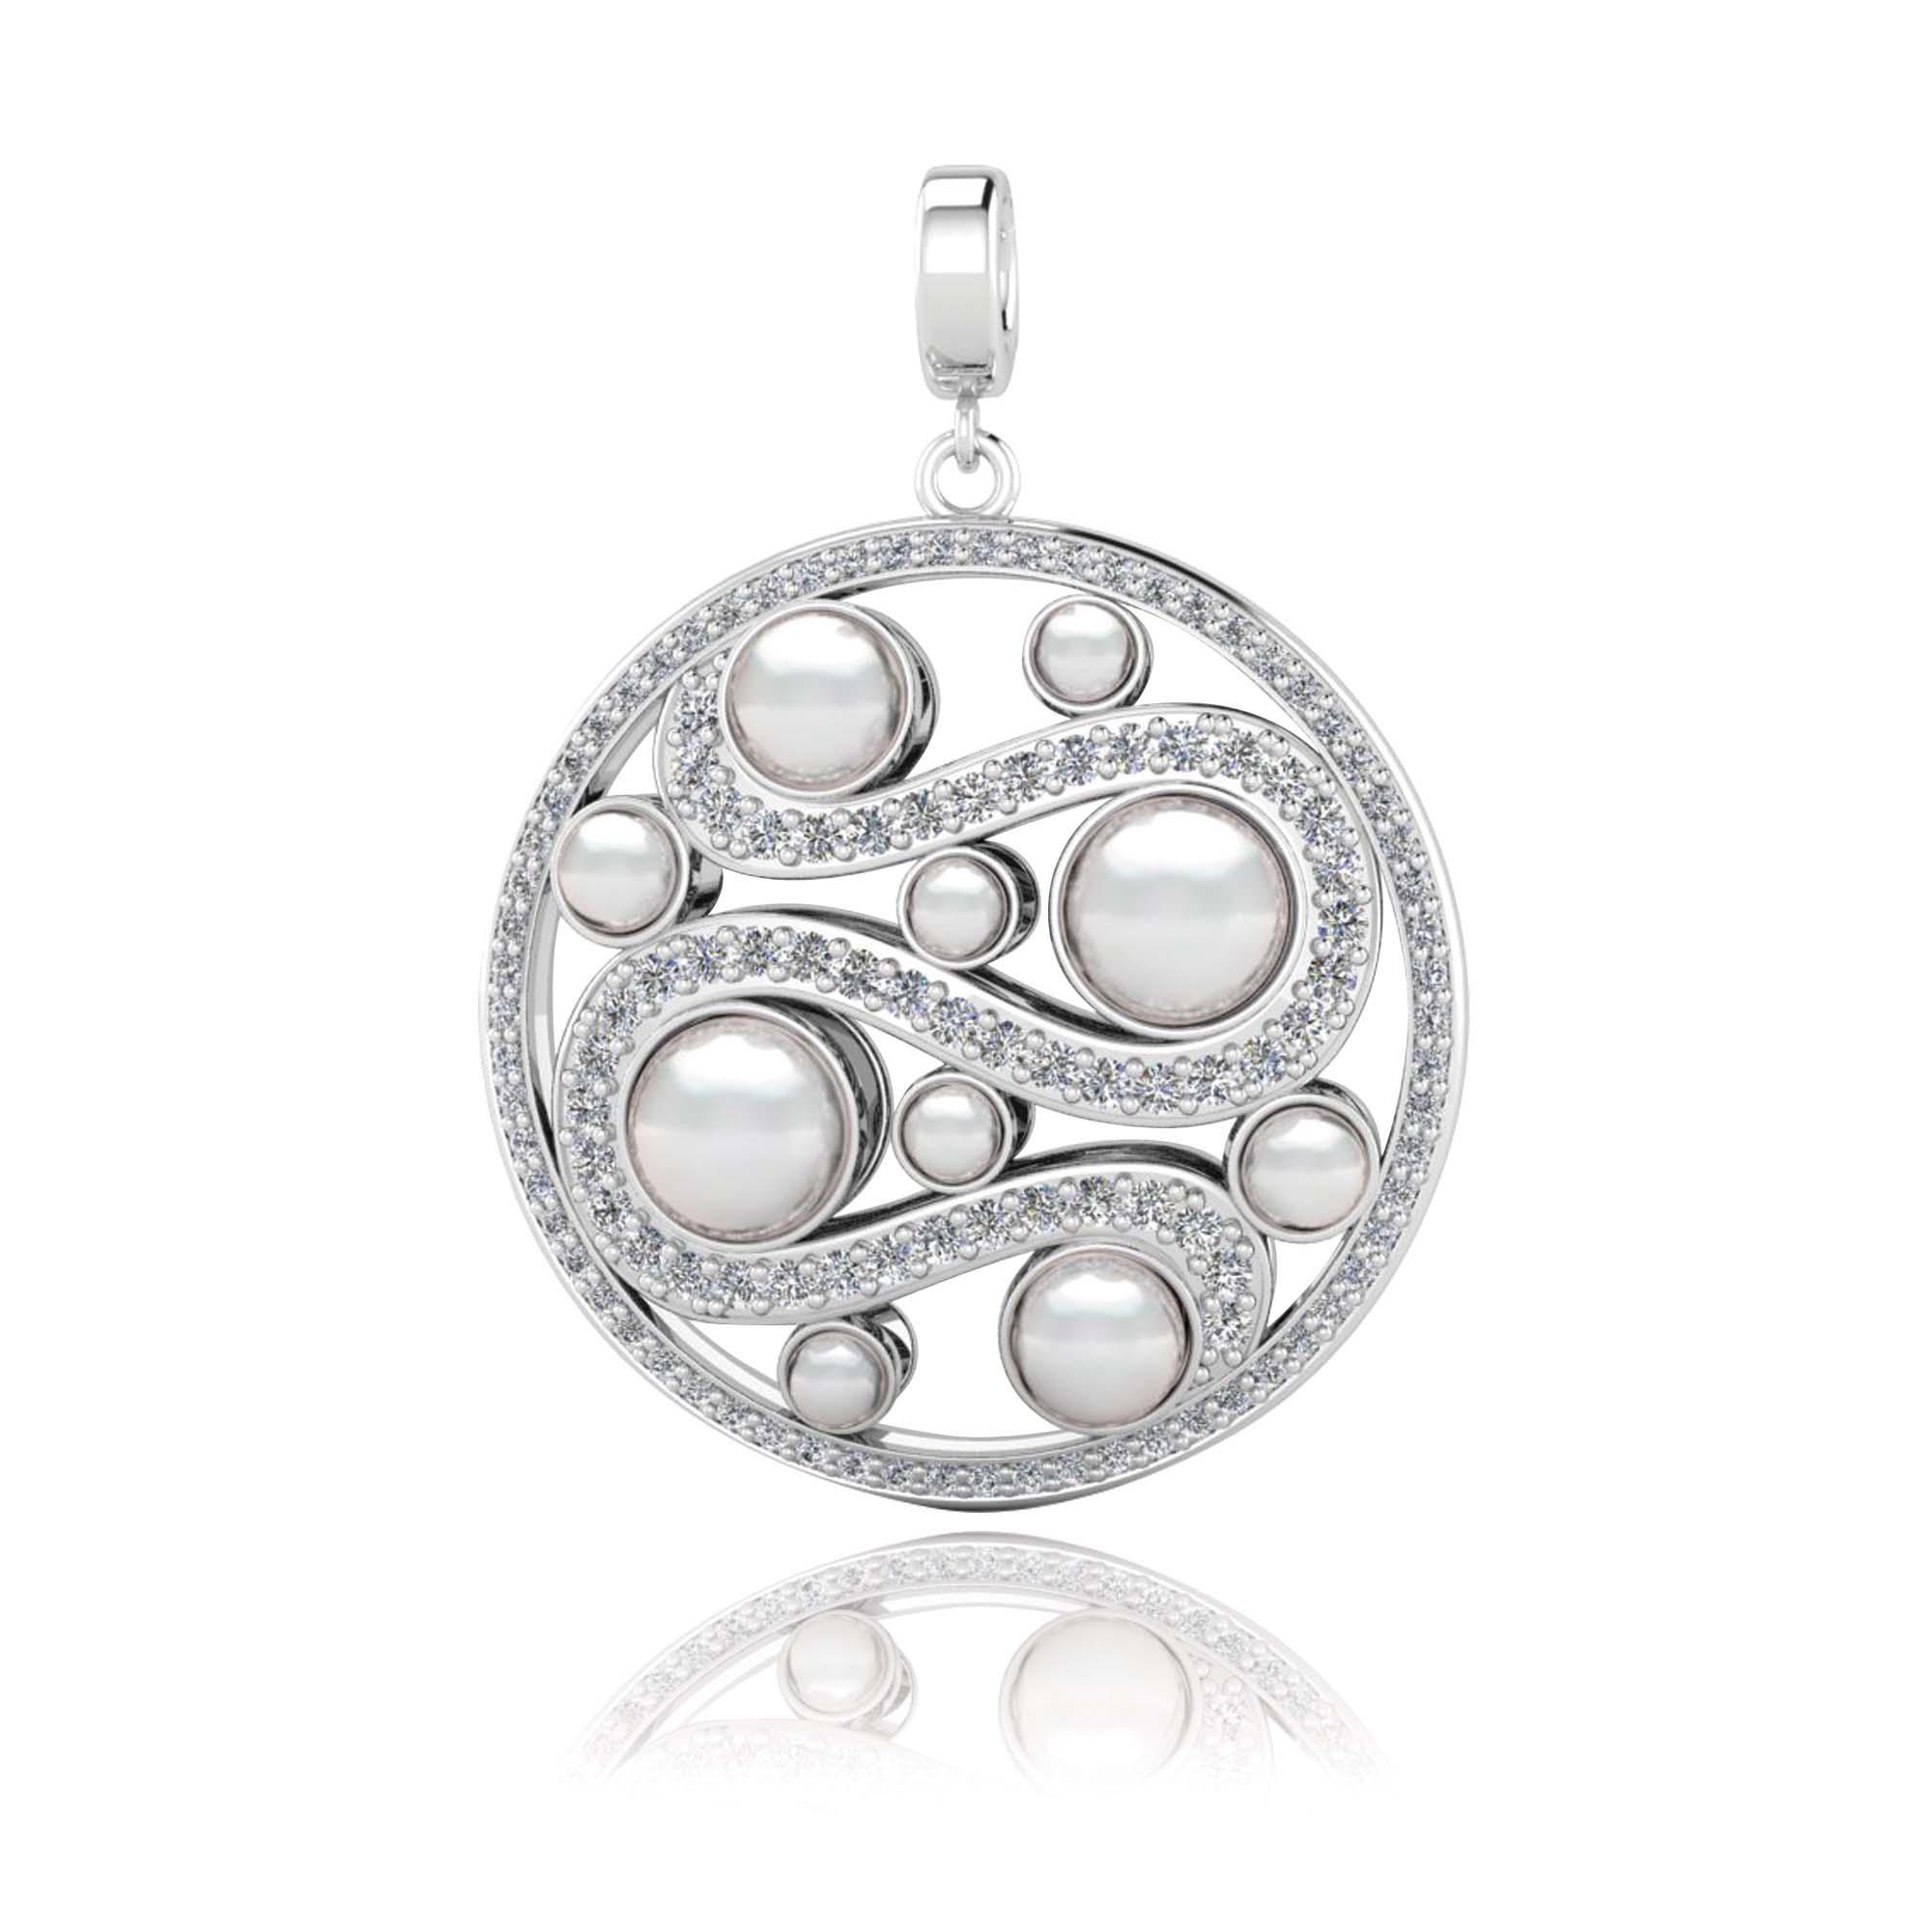 Kagi Mystic Pearl Pendant White Side $249 www.kagi.net